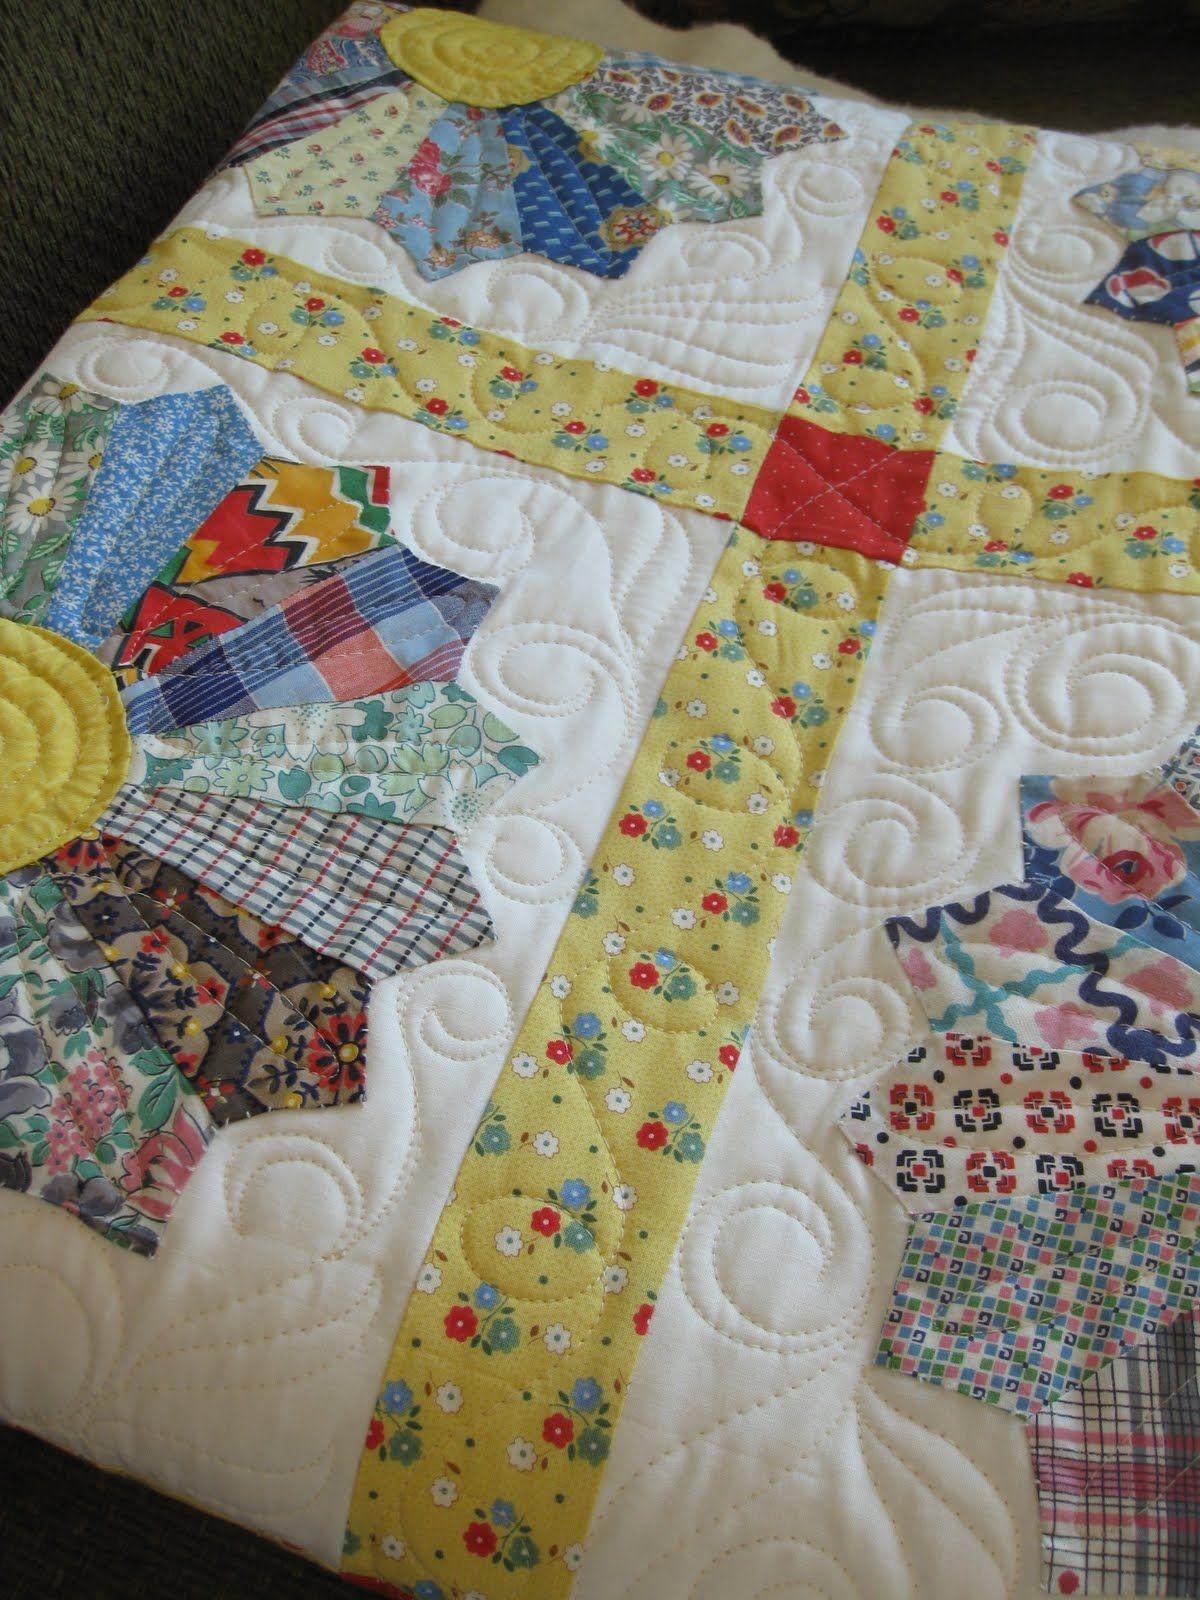 tendido patchwork lindos fotos edredones ideas acolchar inspiracin acolchar diseos de la mano de acolchado patrones de colchas inspiracin maoso